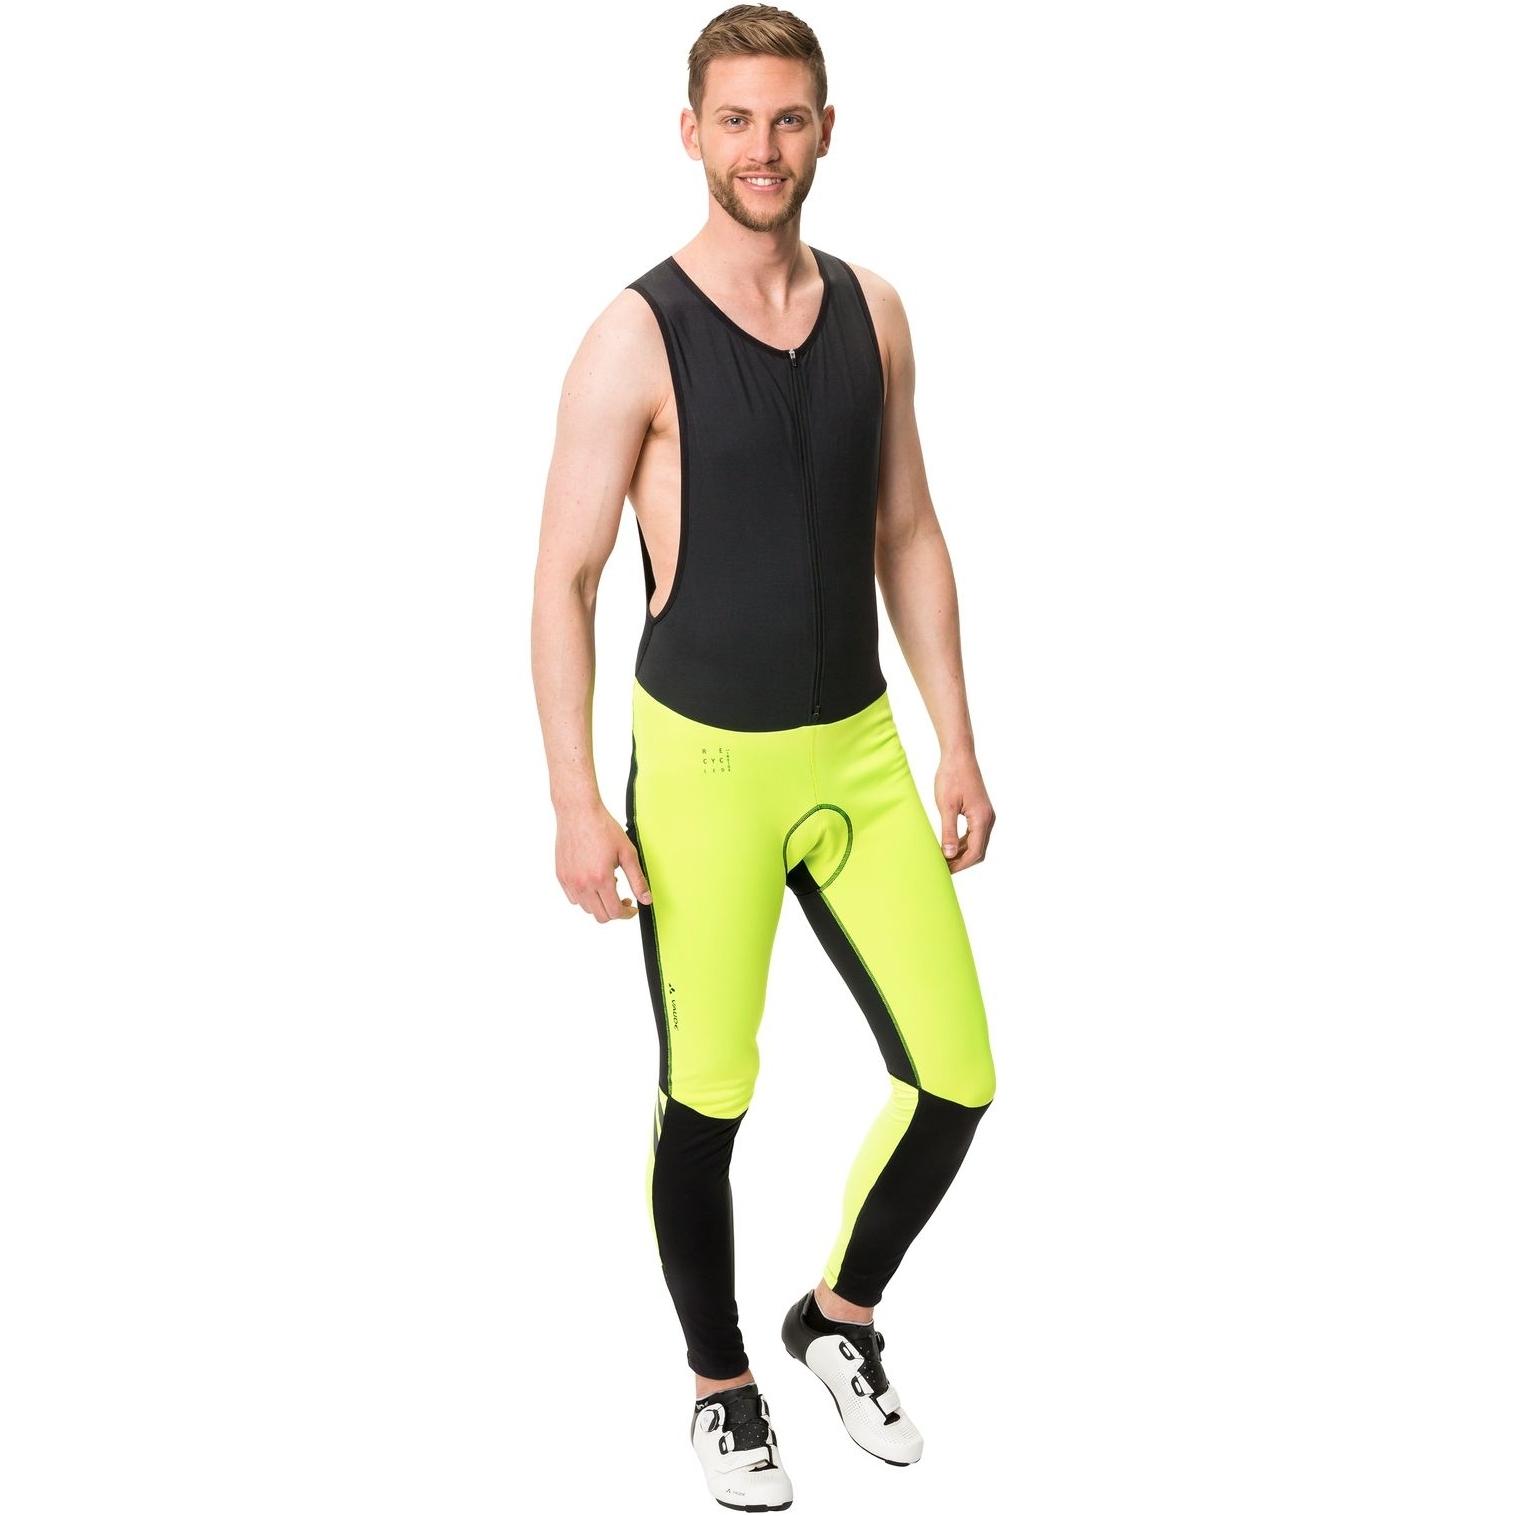 Image of Vaude Men's Posta Warm Bib Tights - neon yellow